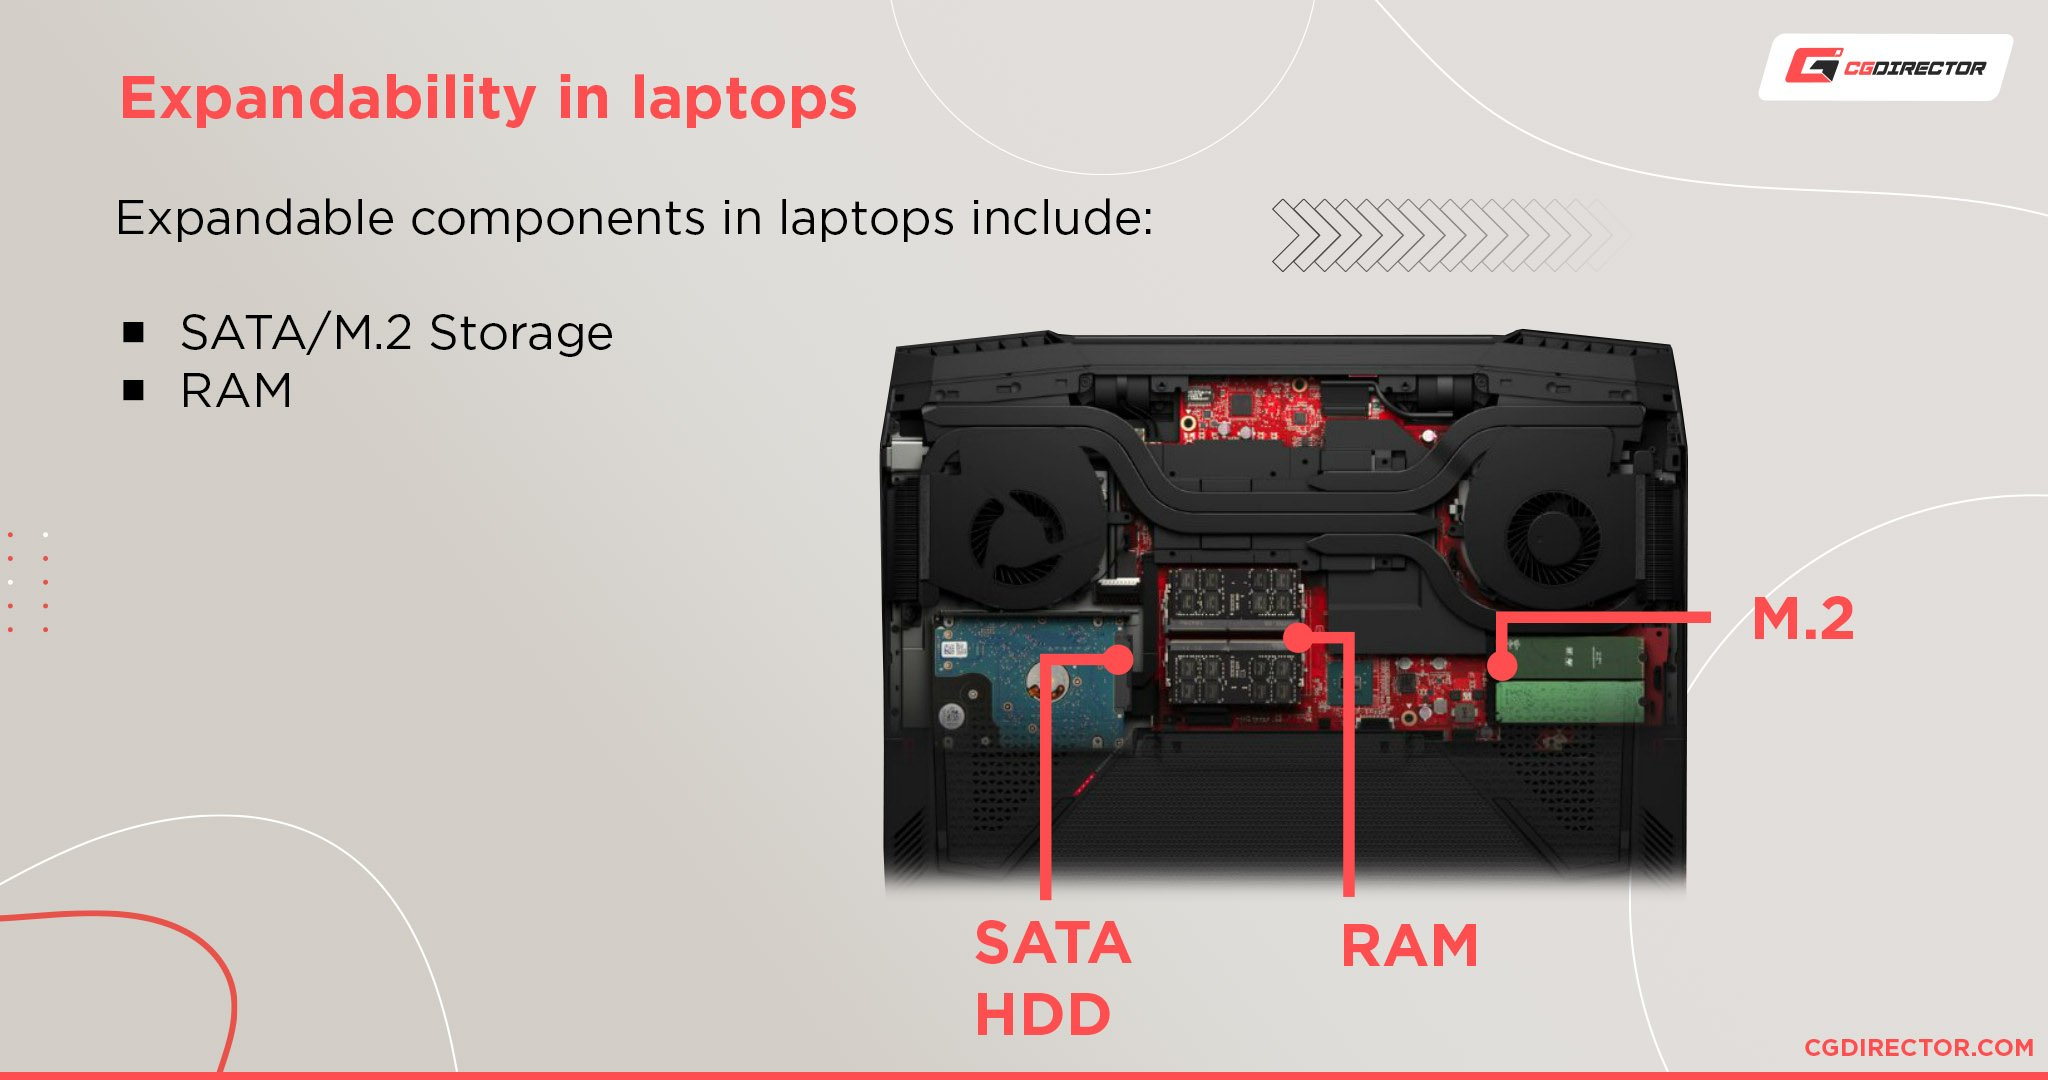 Expandability in laptops